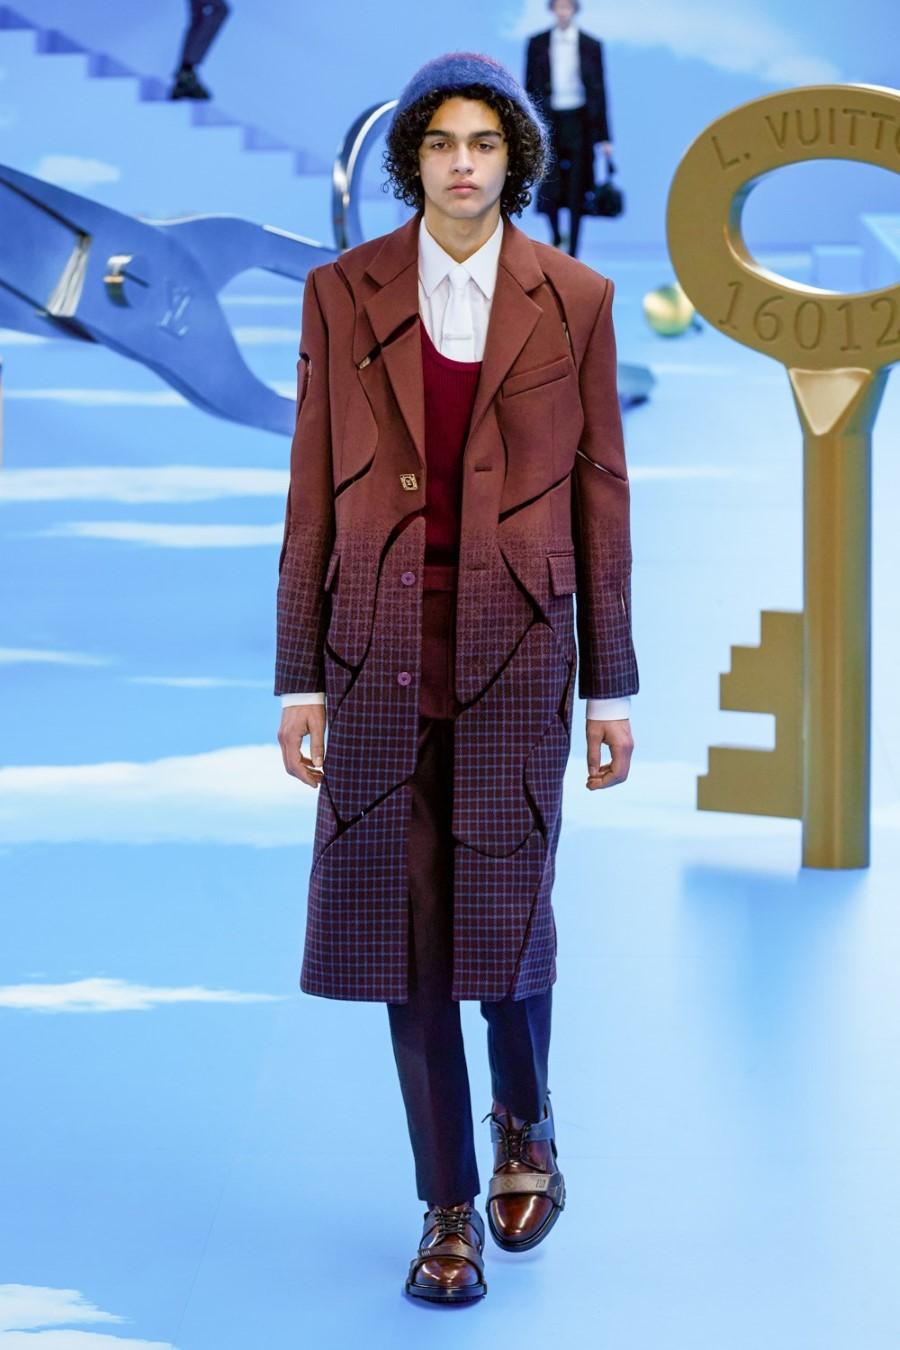 Louis Vuitton - Fall Winter 2020 - Paris Fashion Week Men's